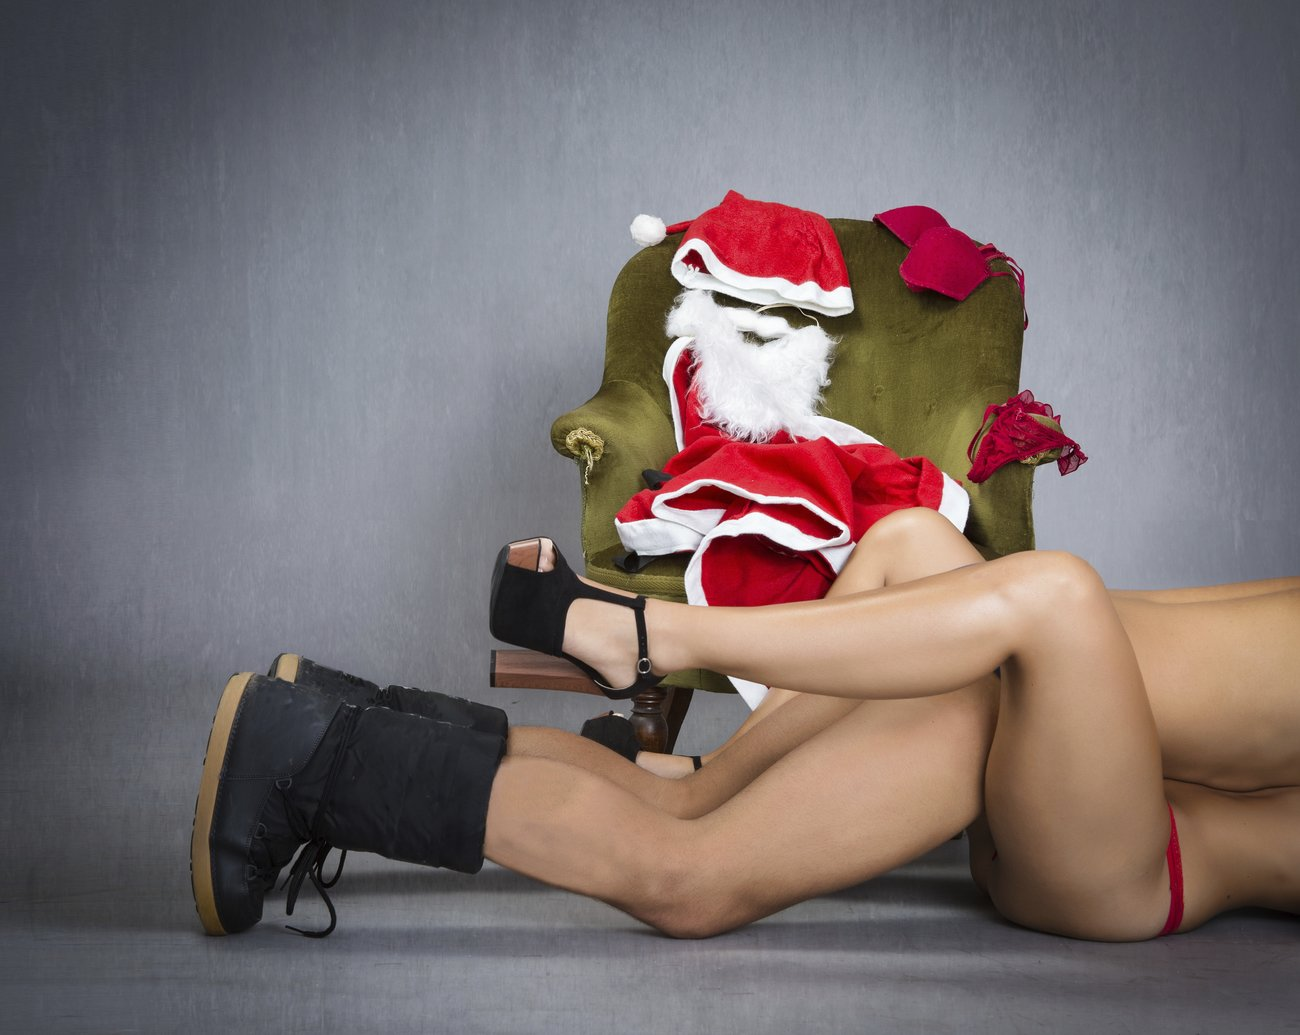 Weihnachtsfeier_iStock_000046225358_Large_marcogarrincha